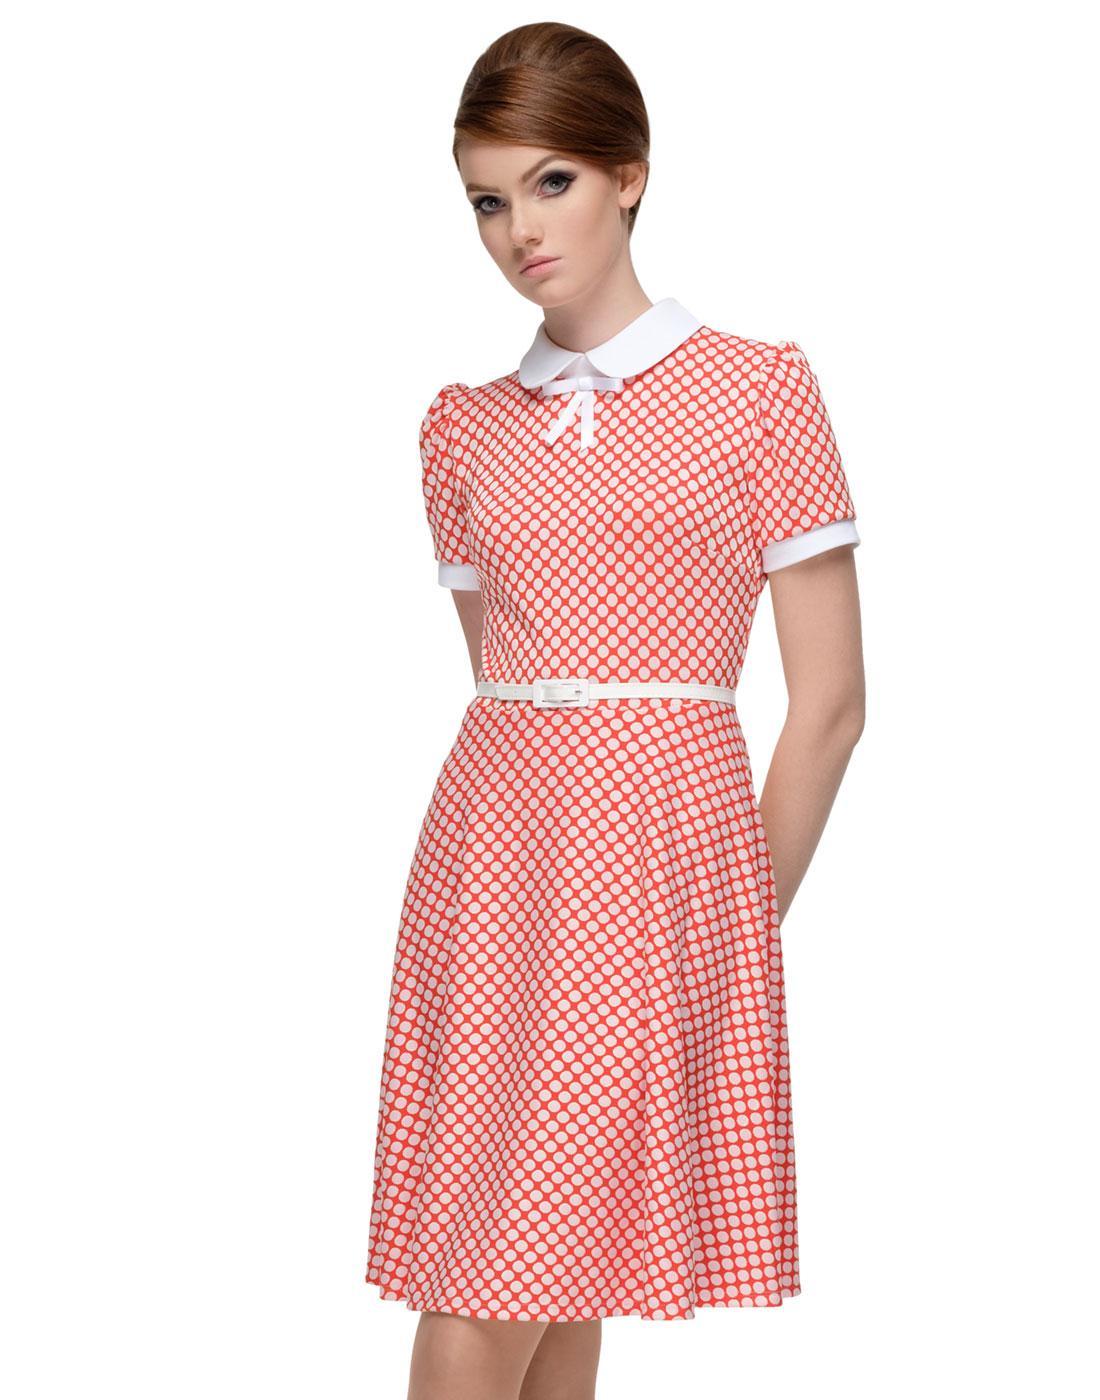 MARMALADE Retro 60s A-Line Polka Dot Mod Dress